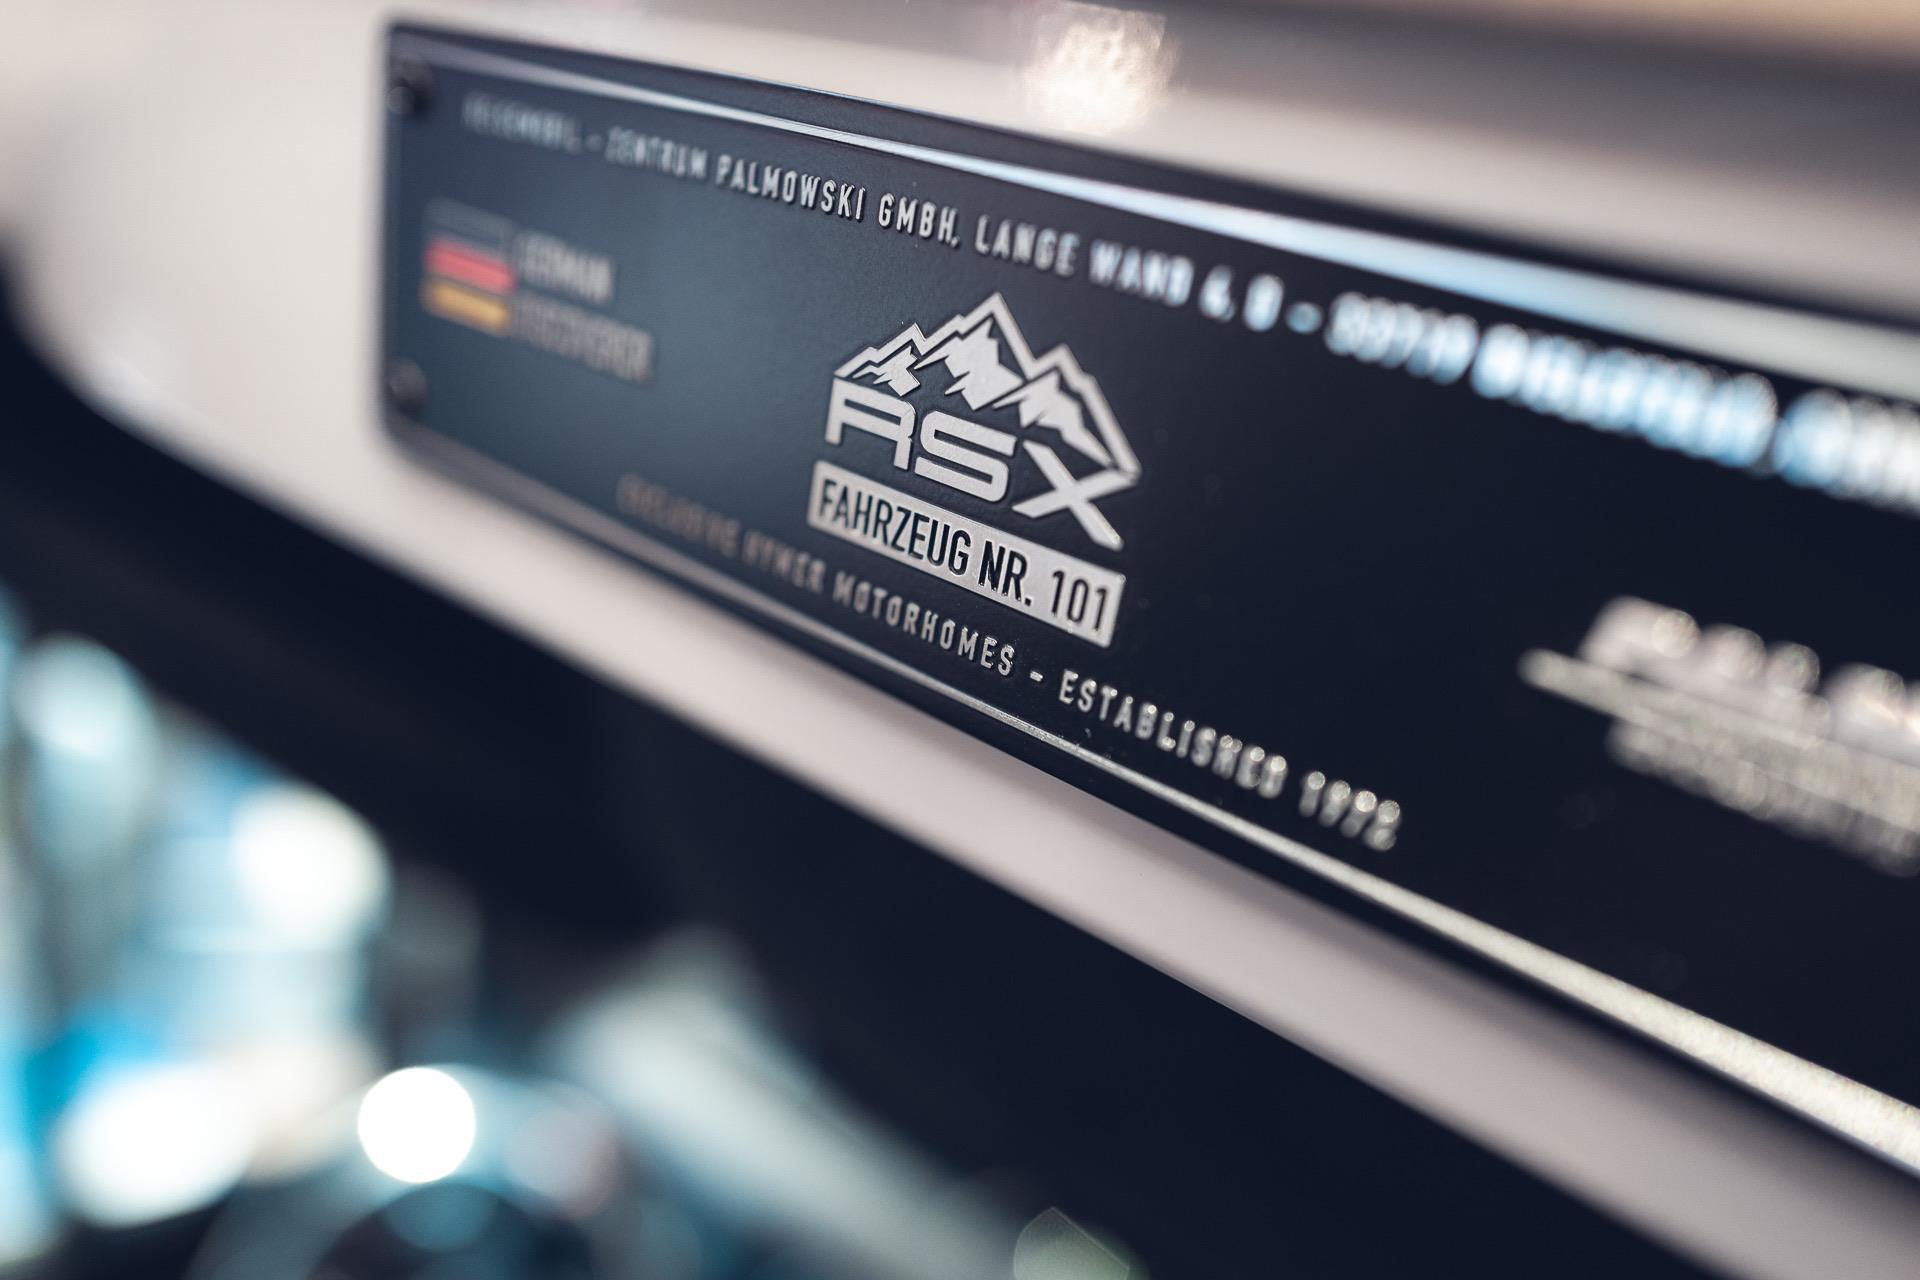 Fahrzeugnummer RSX